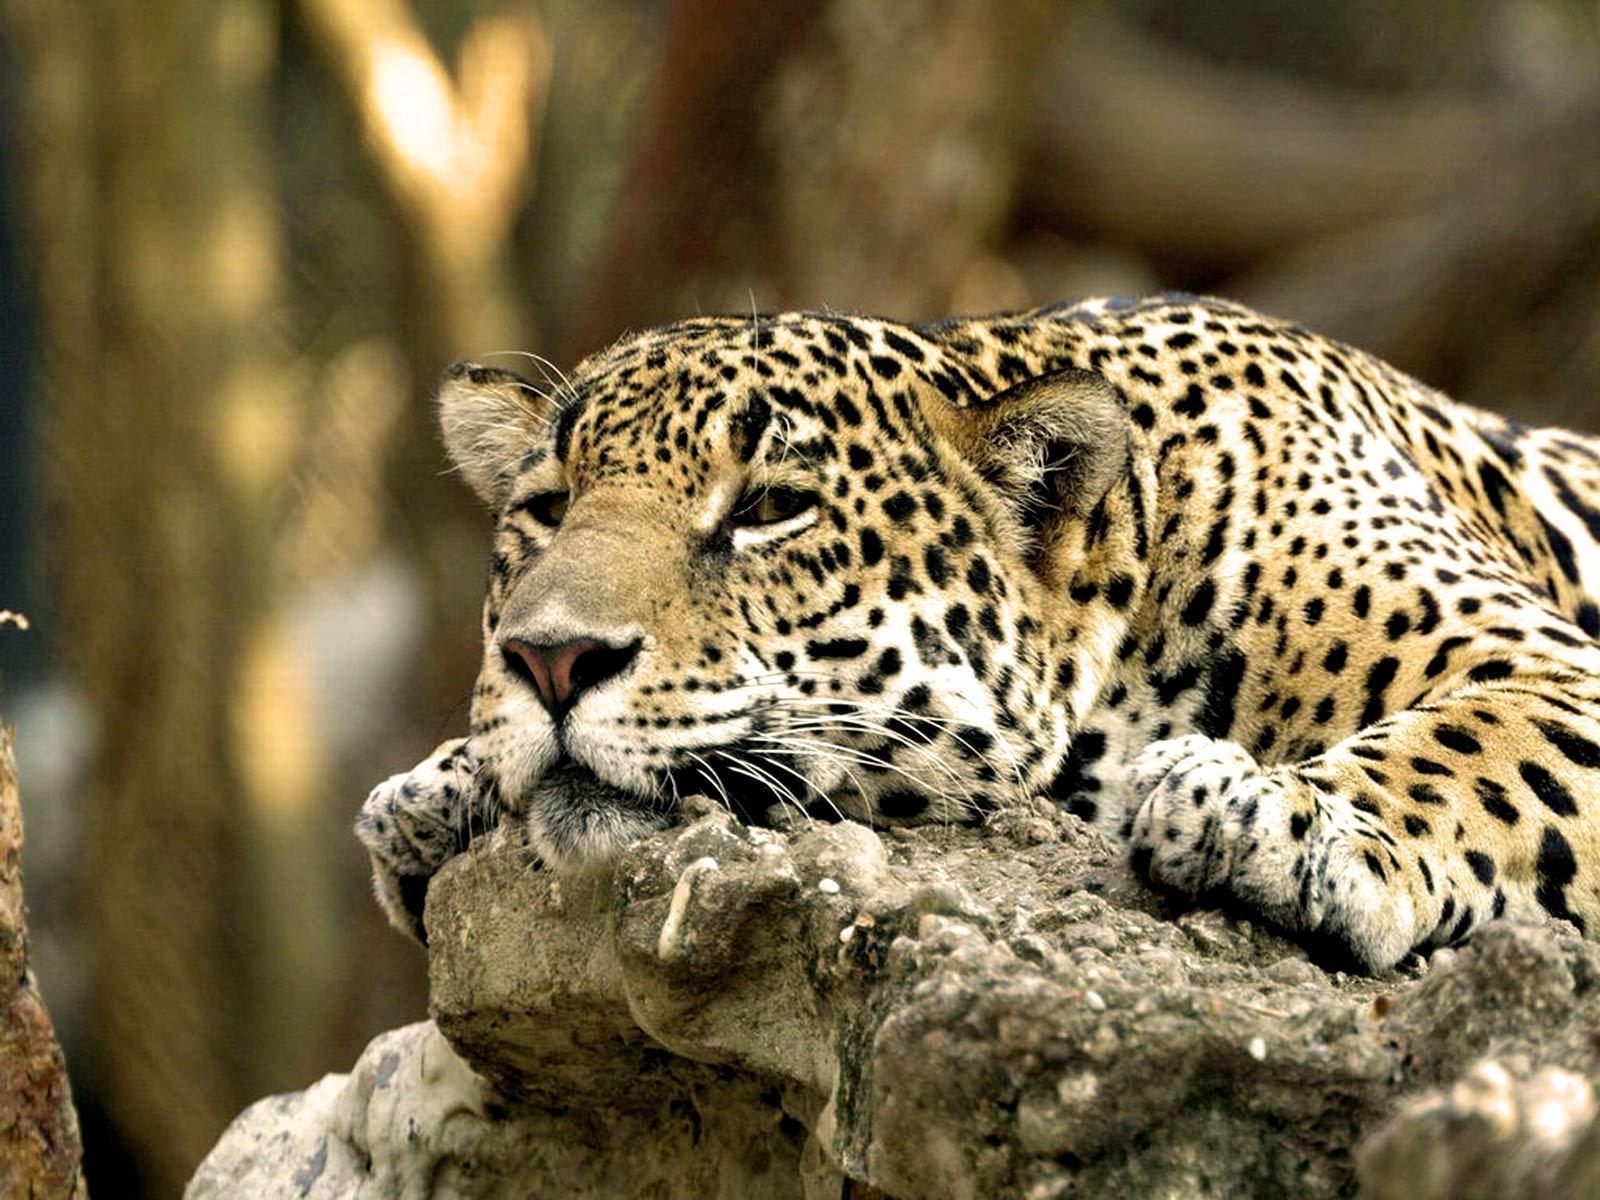 Foto Kafshesh - Faqe 2 Felines-national-geographic-6909280-1600-1200